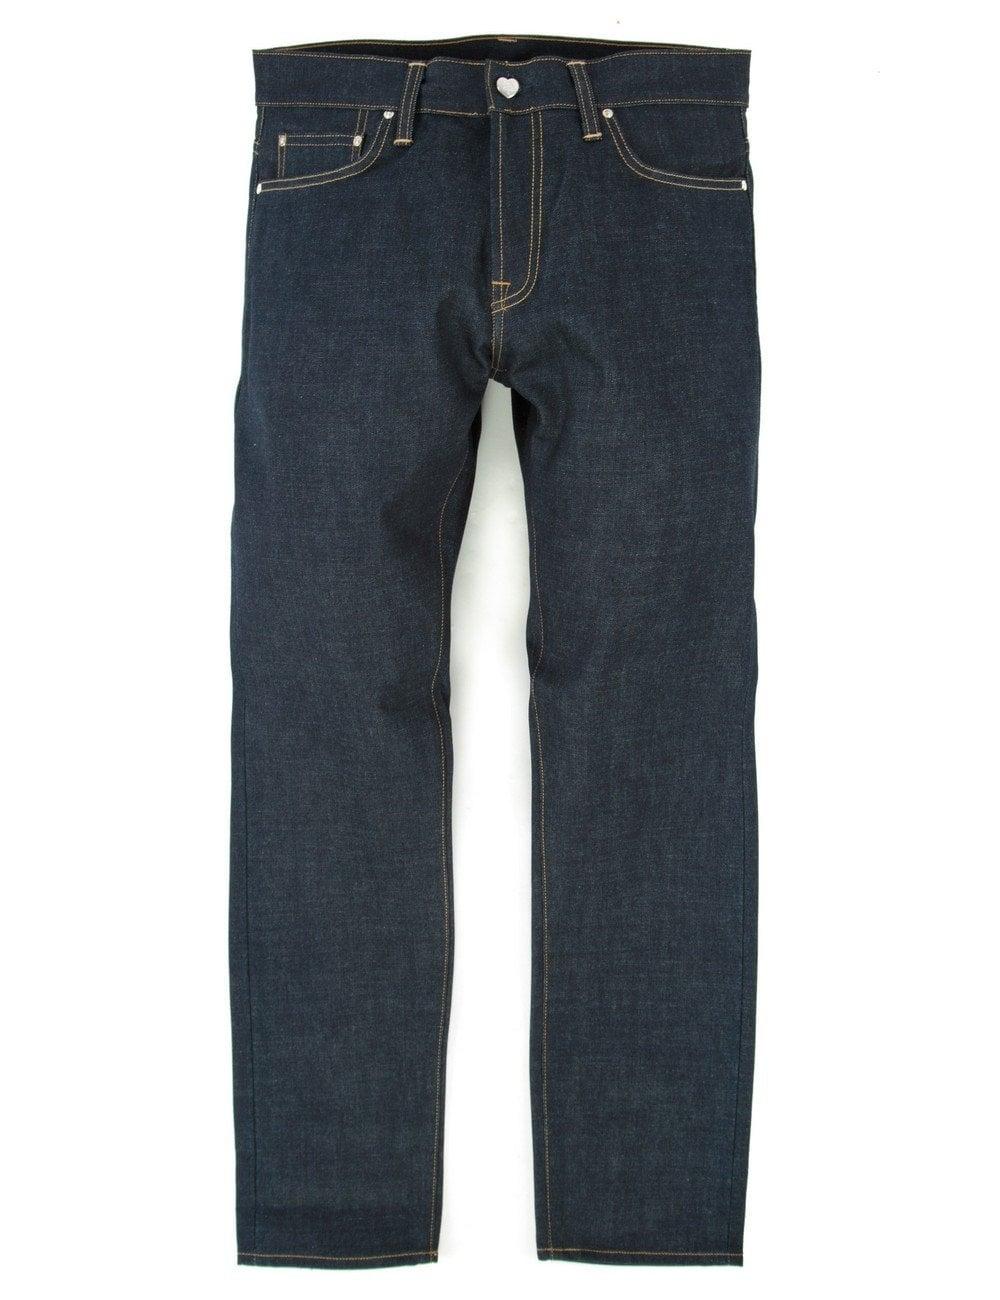 e652926e65 Carhartt WIP XXV Klondike Pant - Blue Rigid Denim - Clothing from ...